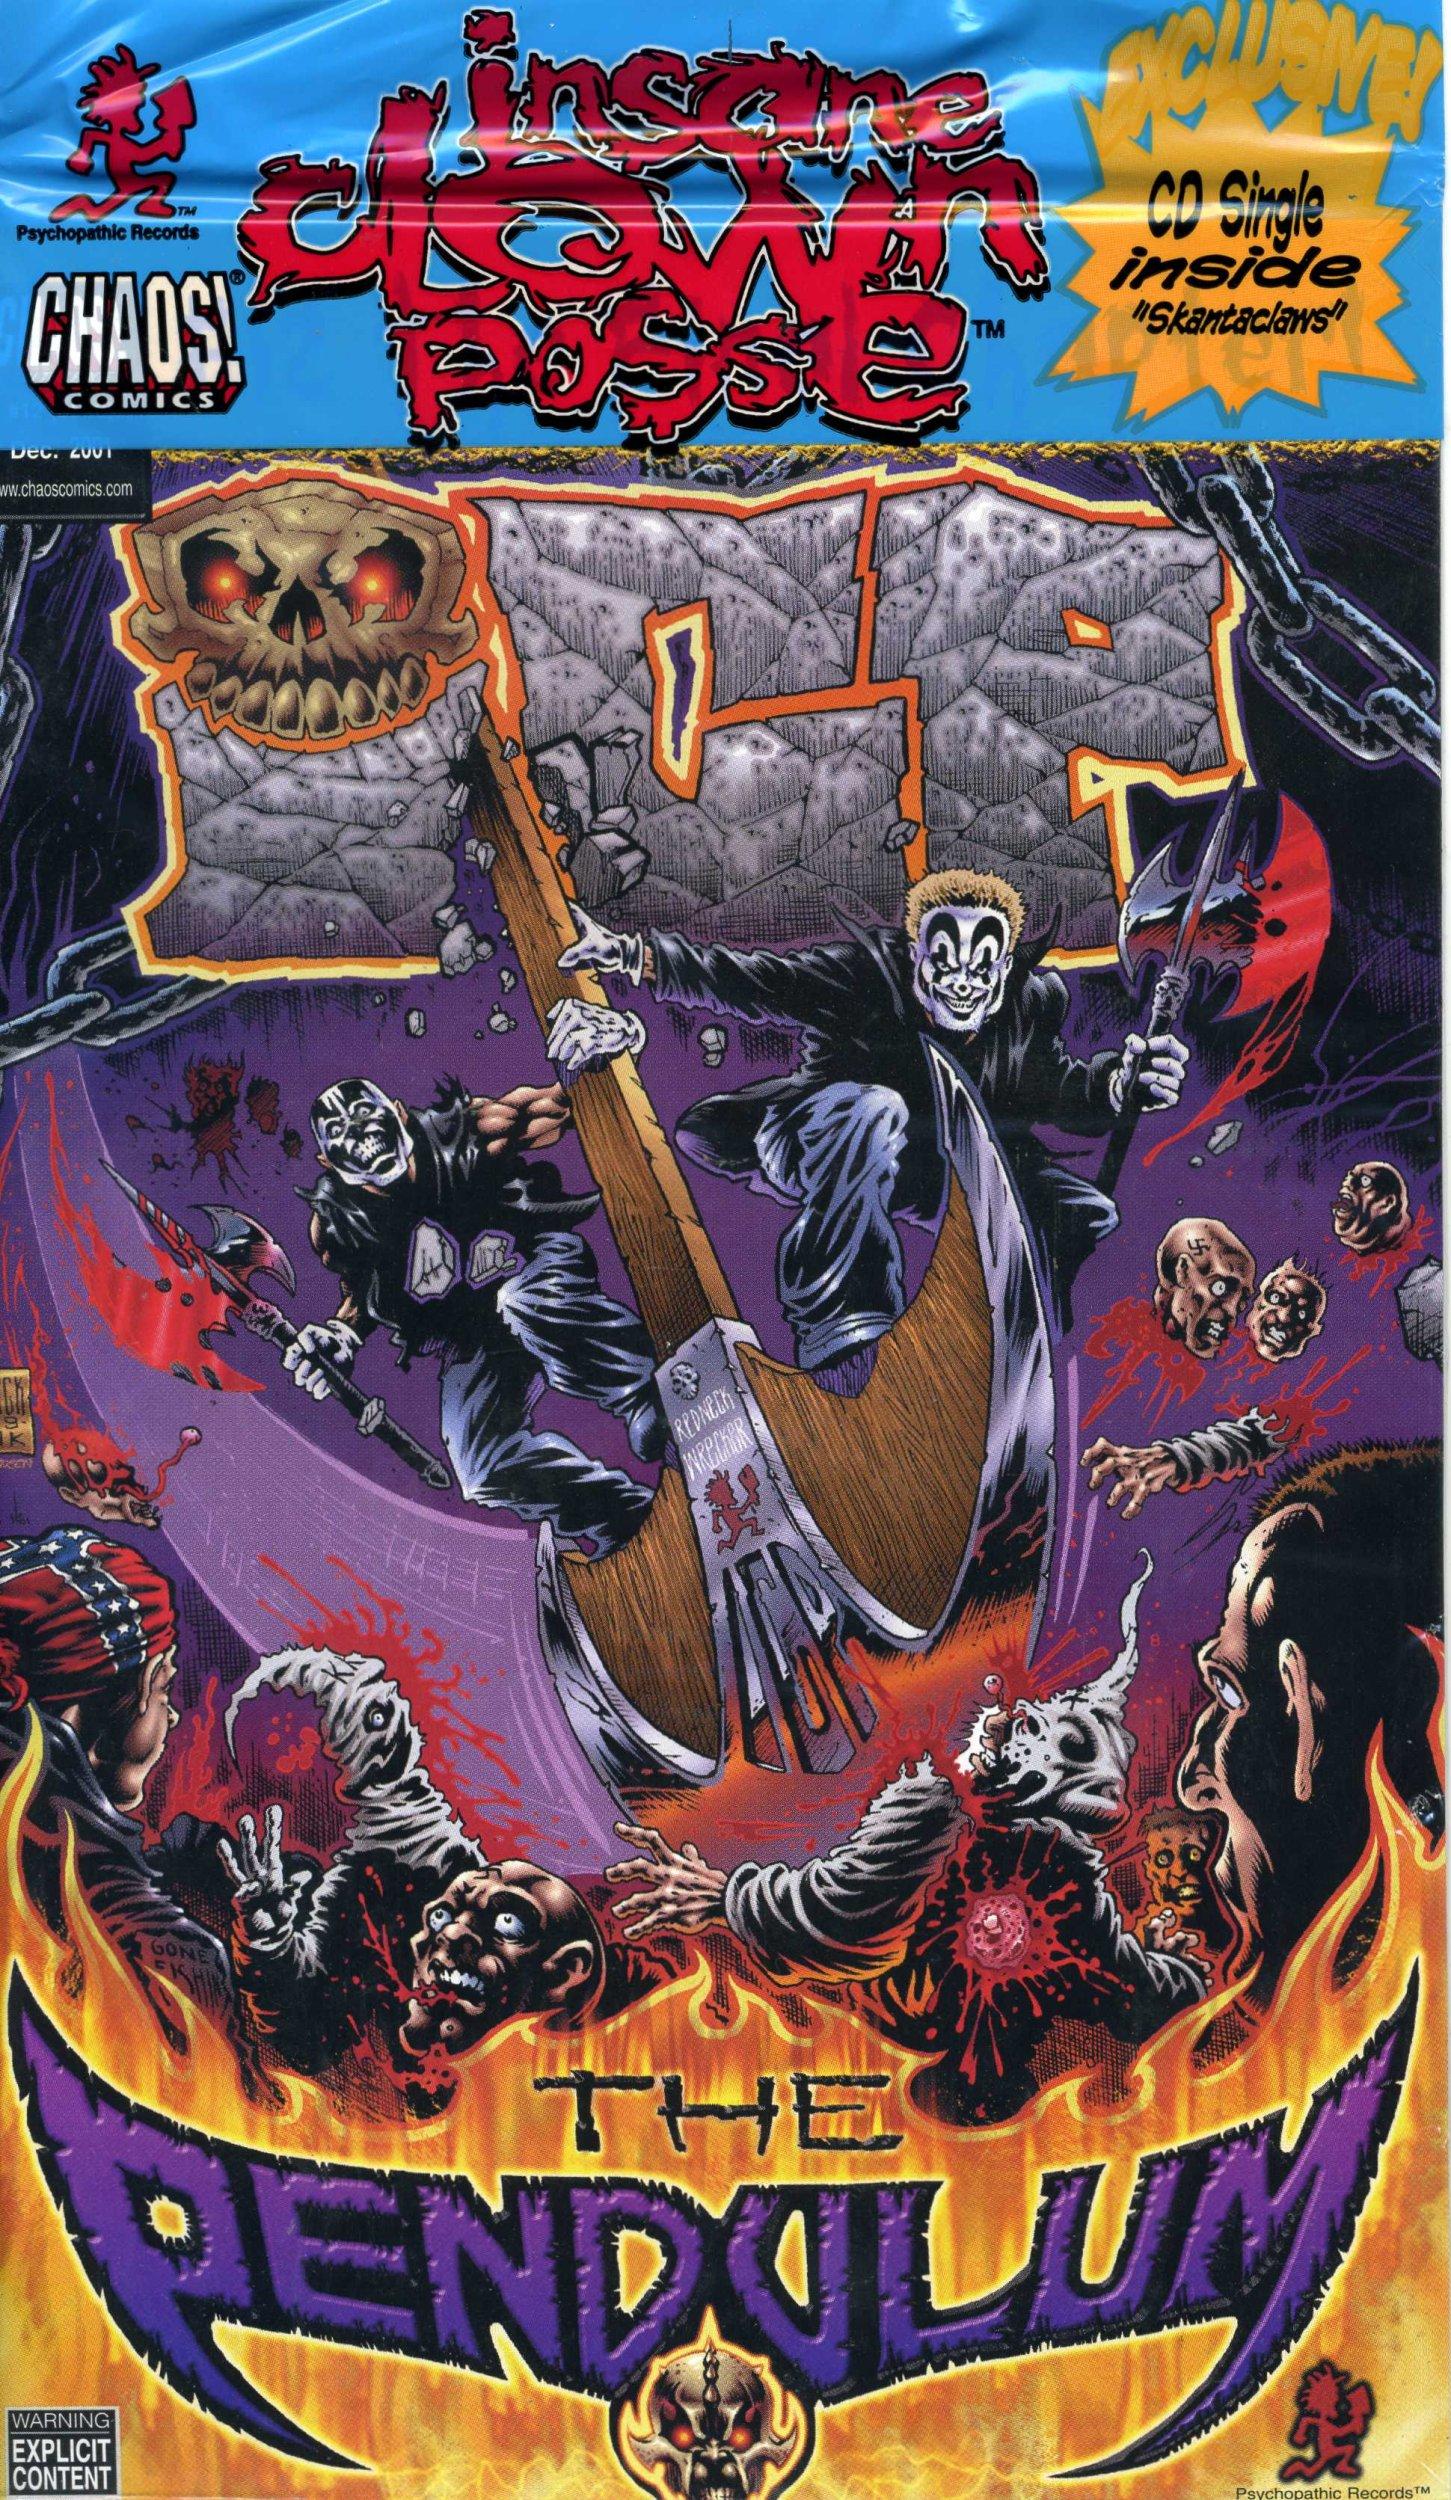 INSANE CLOWN POSSE The Pendulum #12b Comic & CD NEW ICP pdf epub